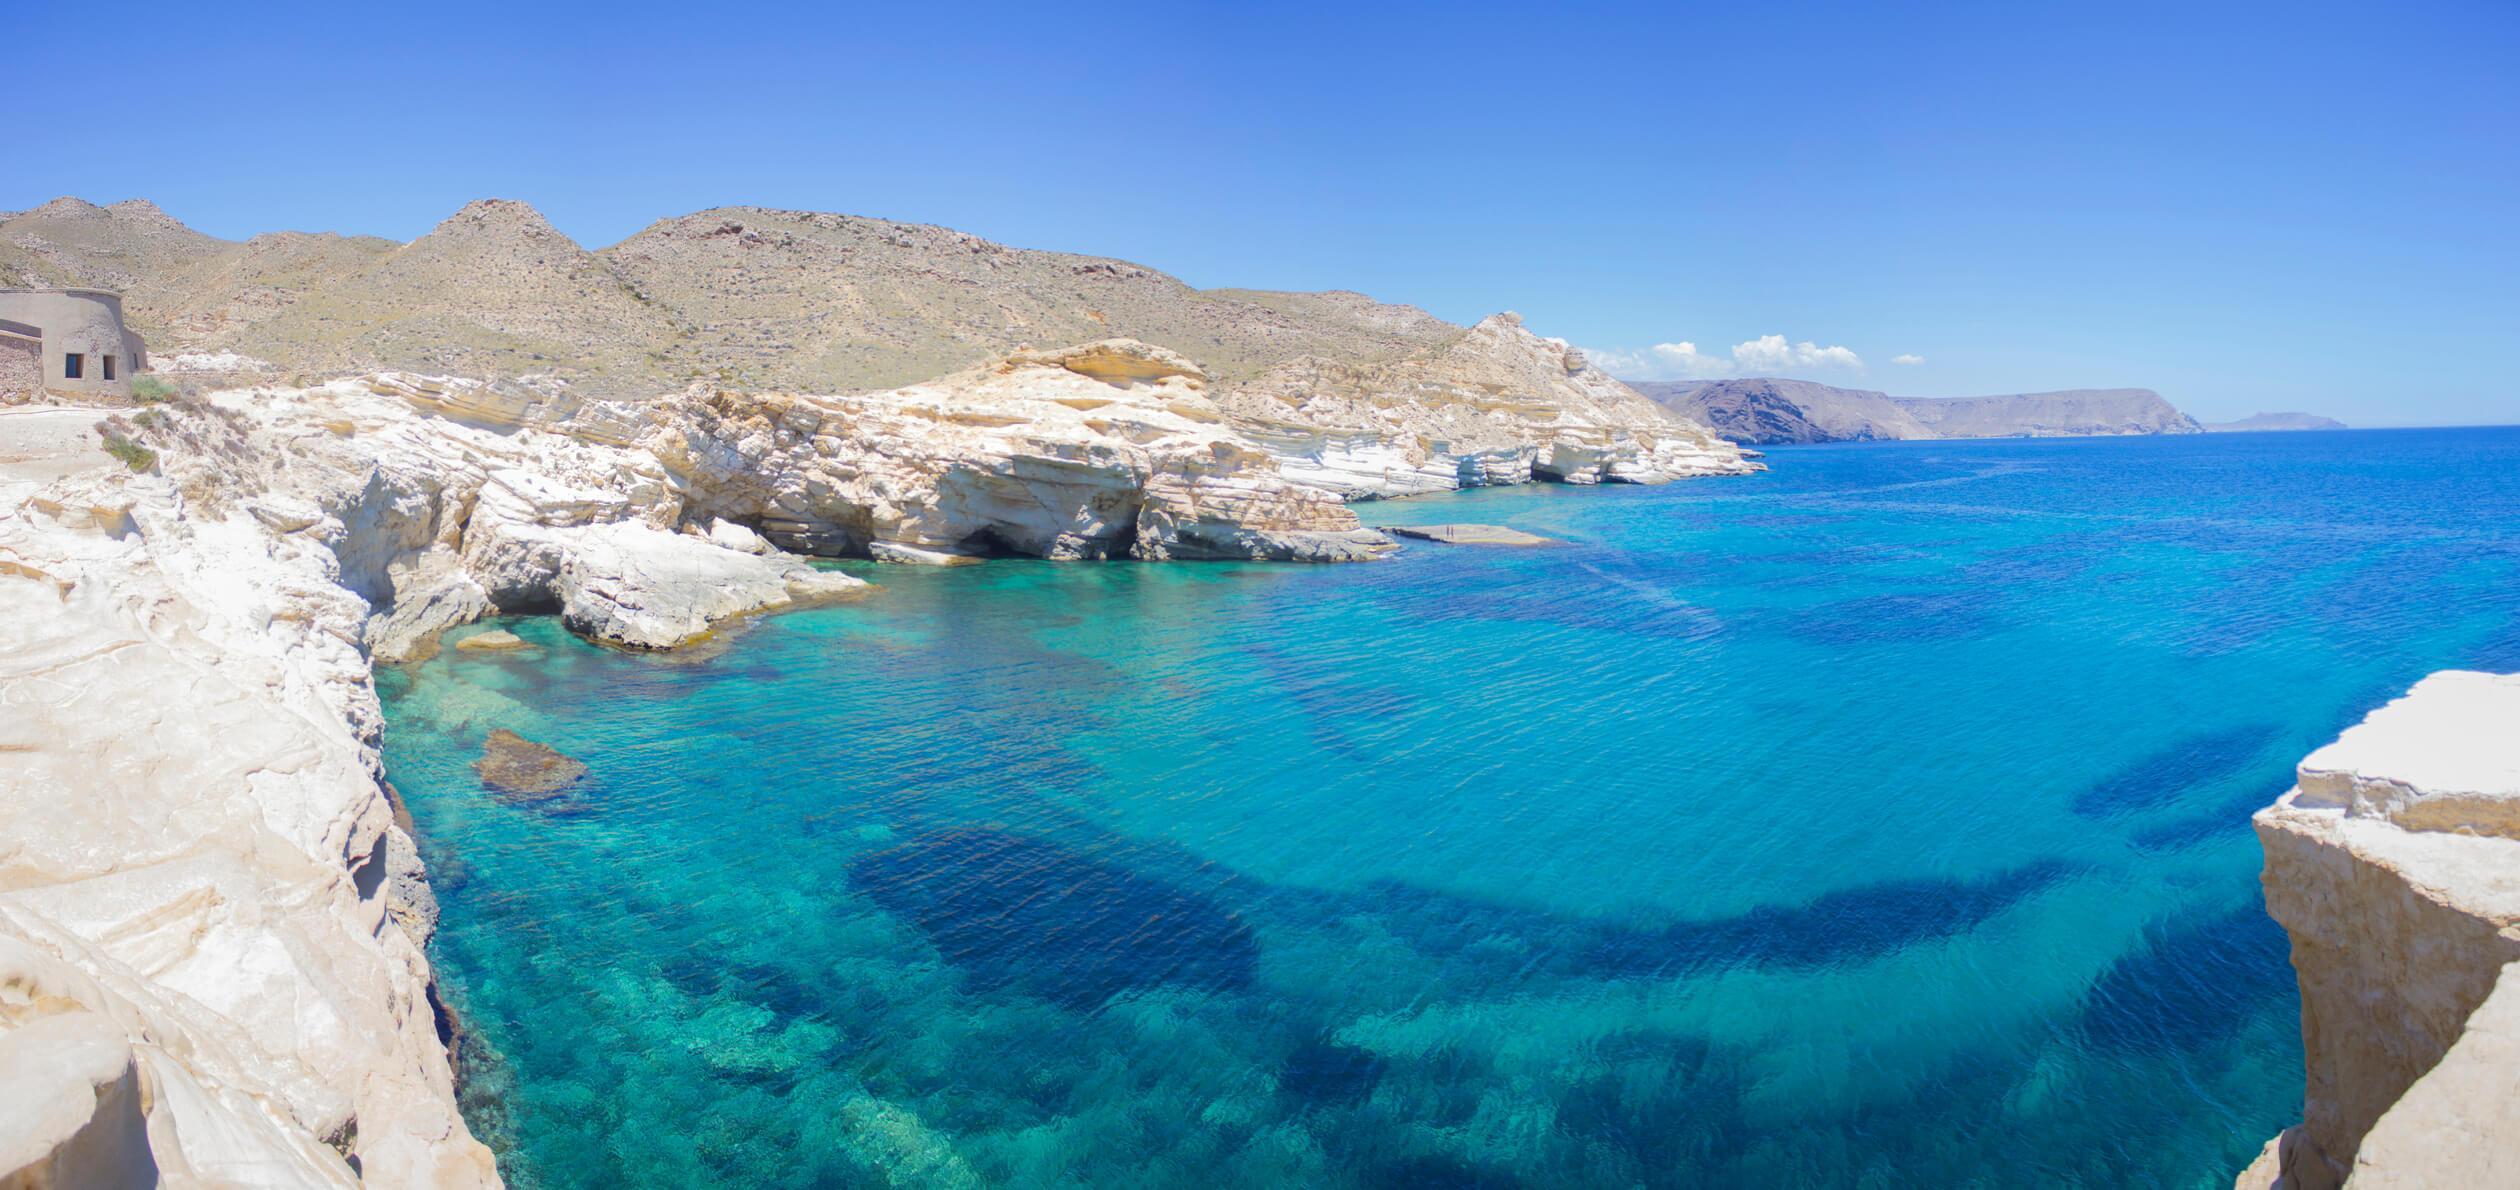 Viaje al Cabo de Gata